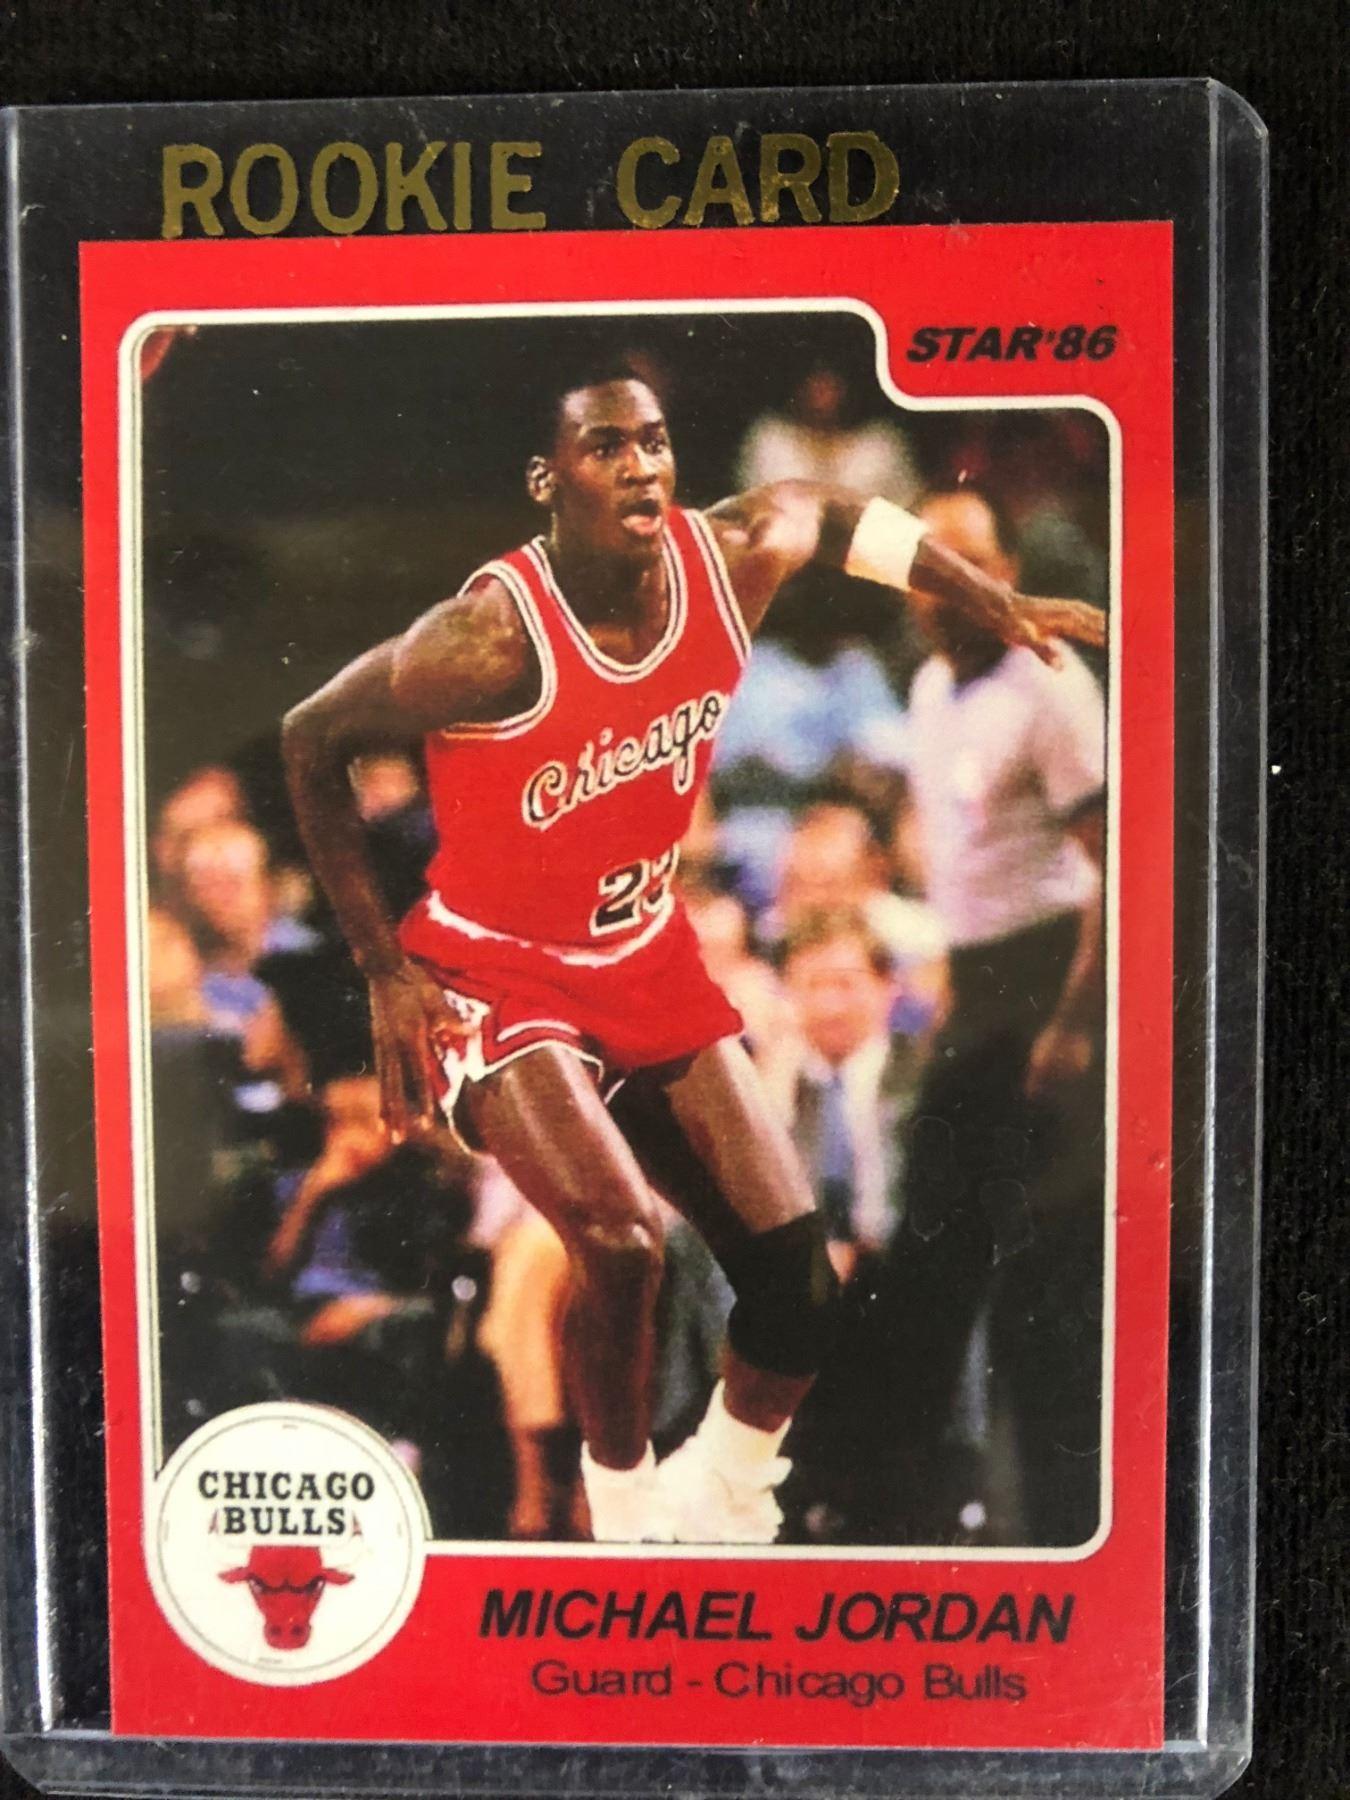 1986 Star 117 Michael Jordan Rookie Card